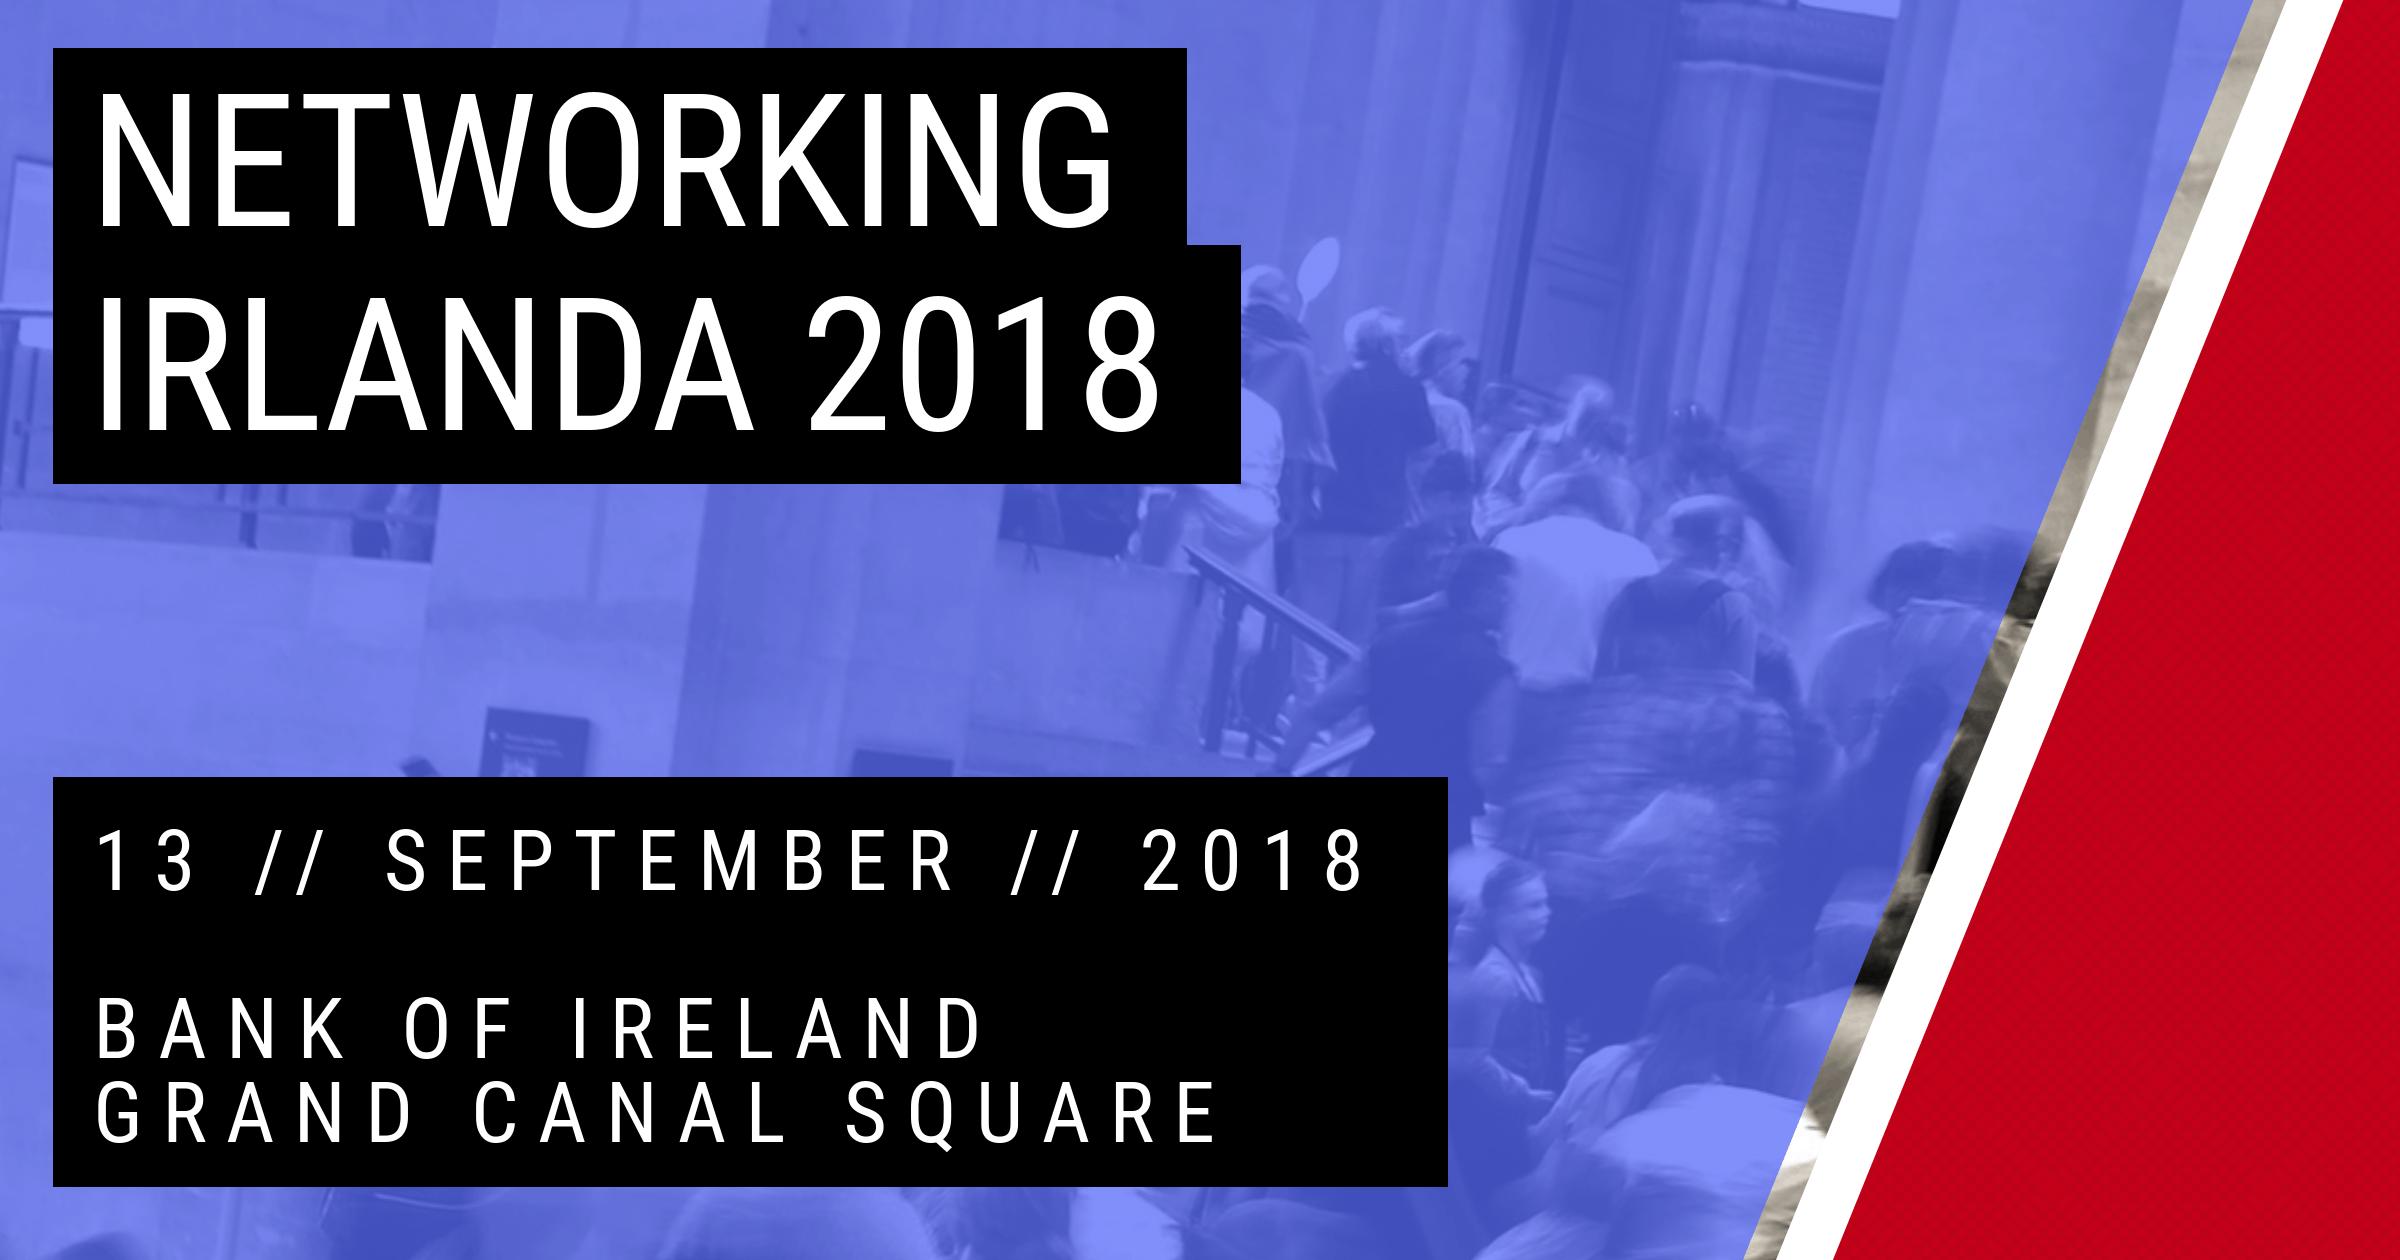 Profesionales Irlanda - Networking Irlanda 2018 - Latin American Professionals in Ireland - Ireland Professional Network